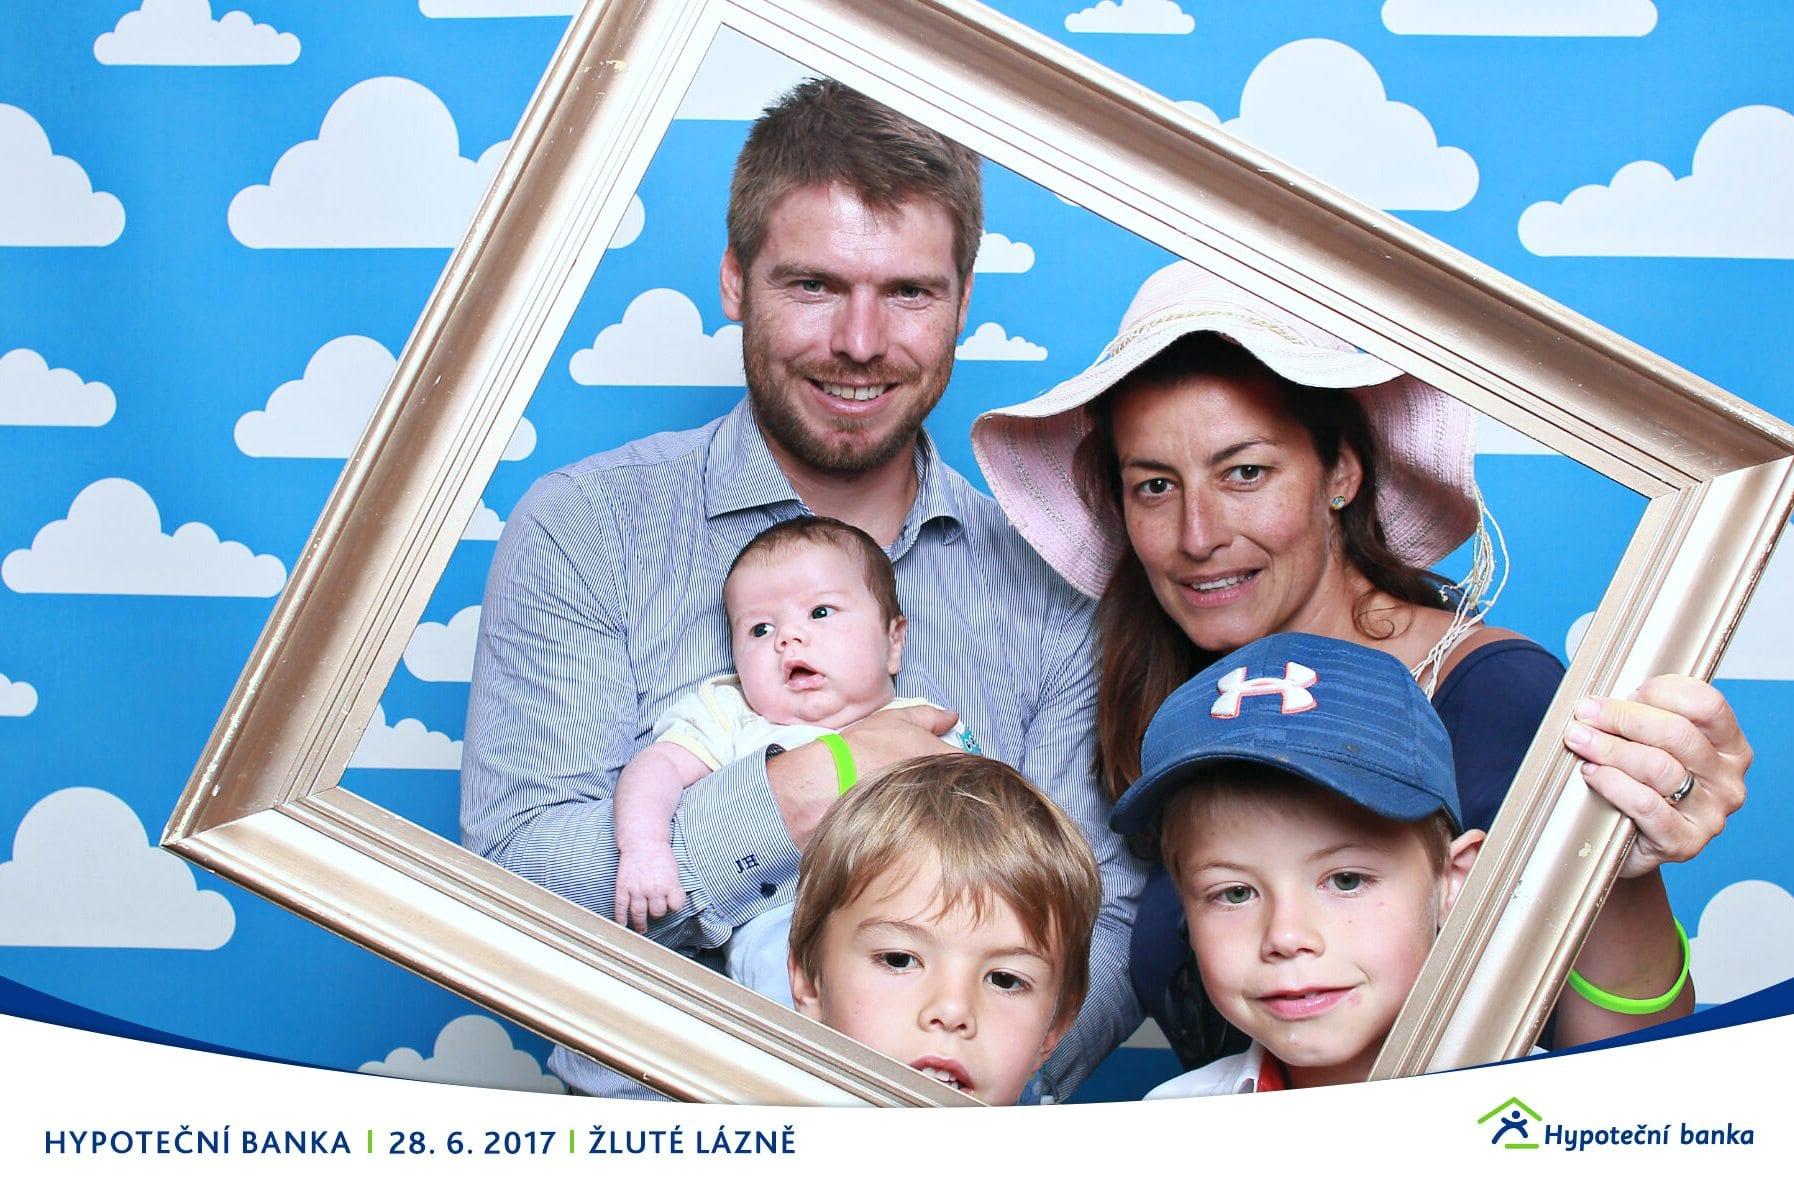 fotokoutek-hypotecni-banka-28-6-2017-274718